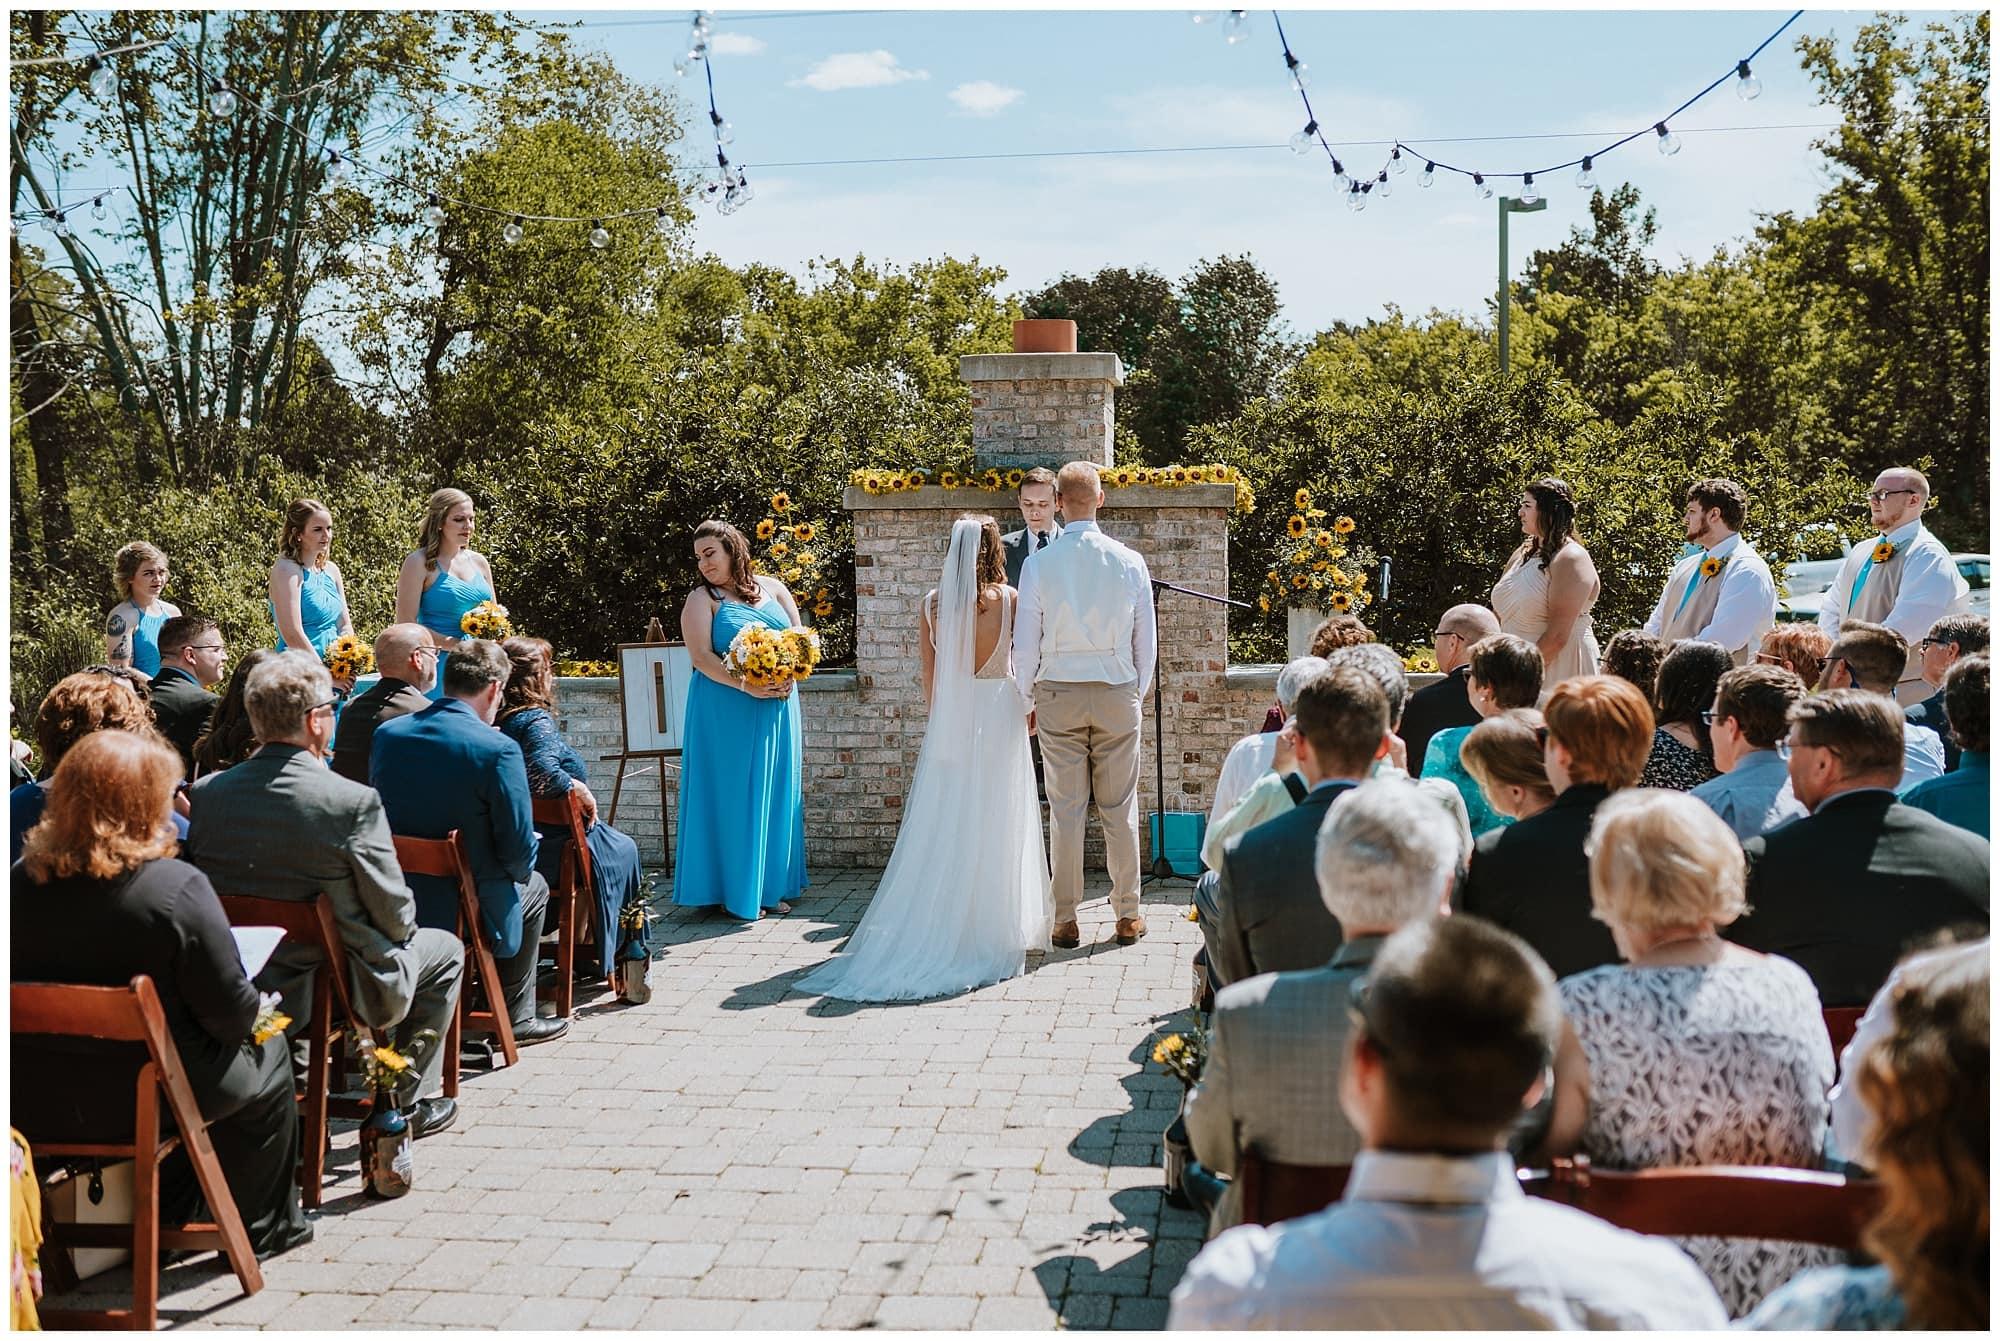 Fenton Winery and Brewery Wedding_0035.jpg